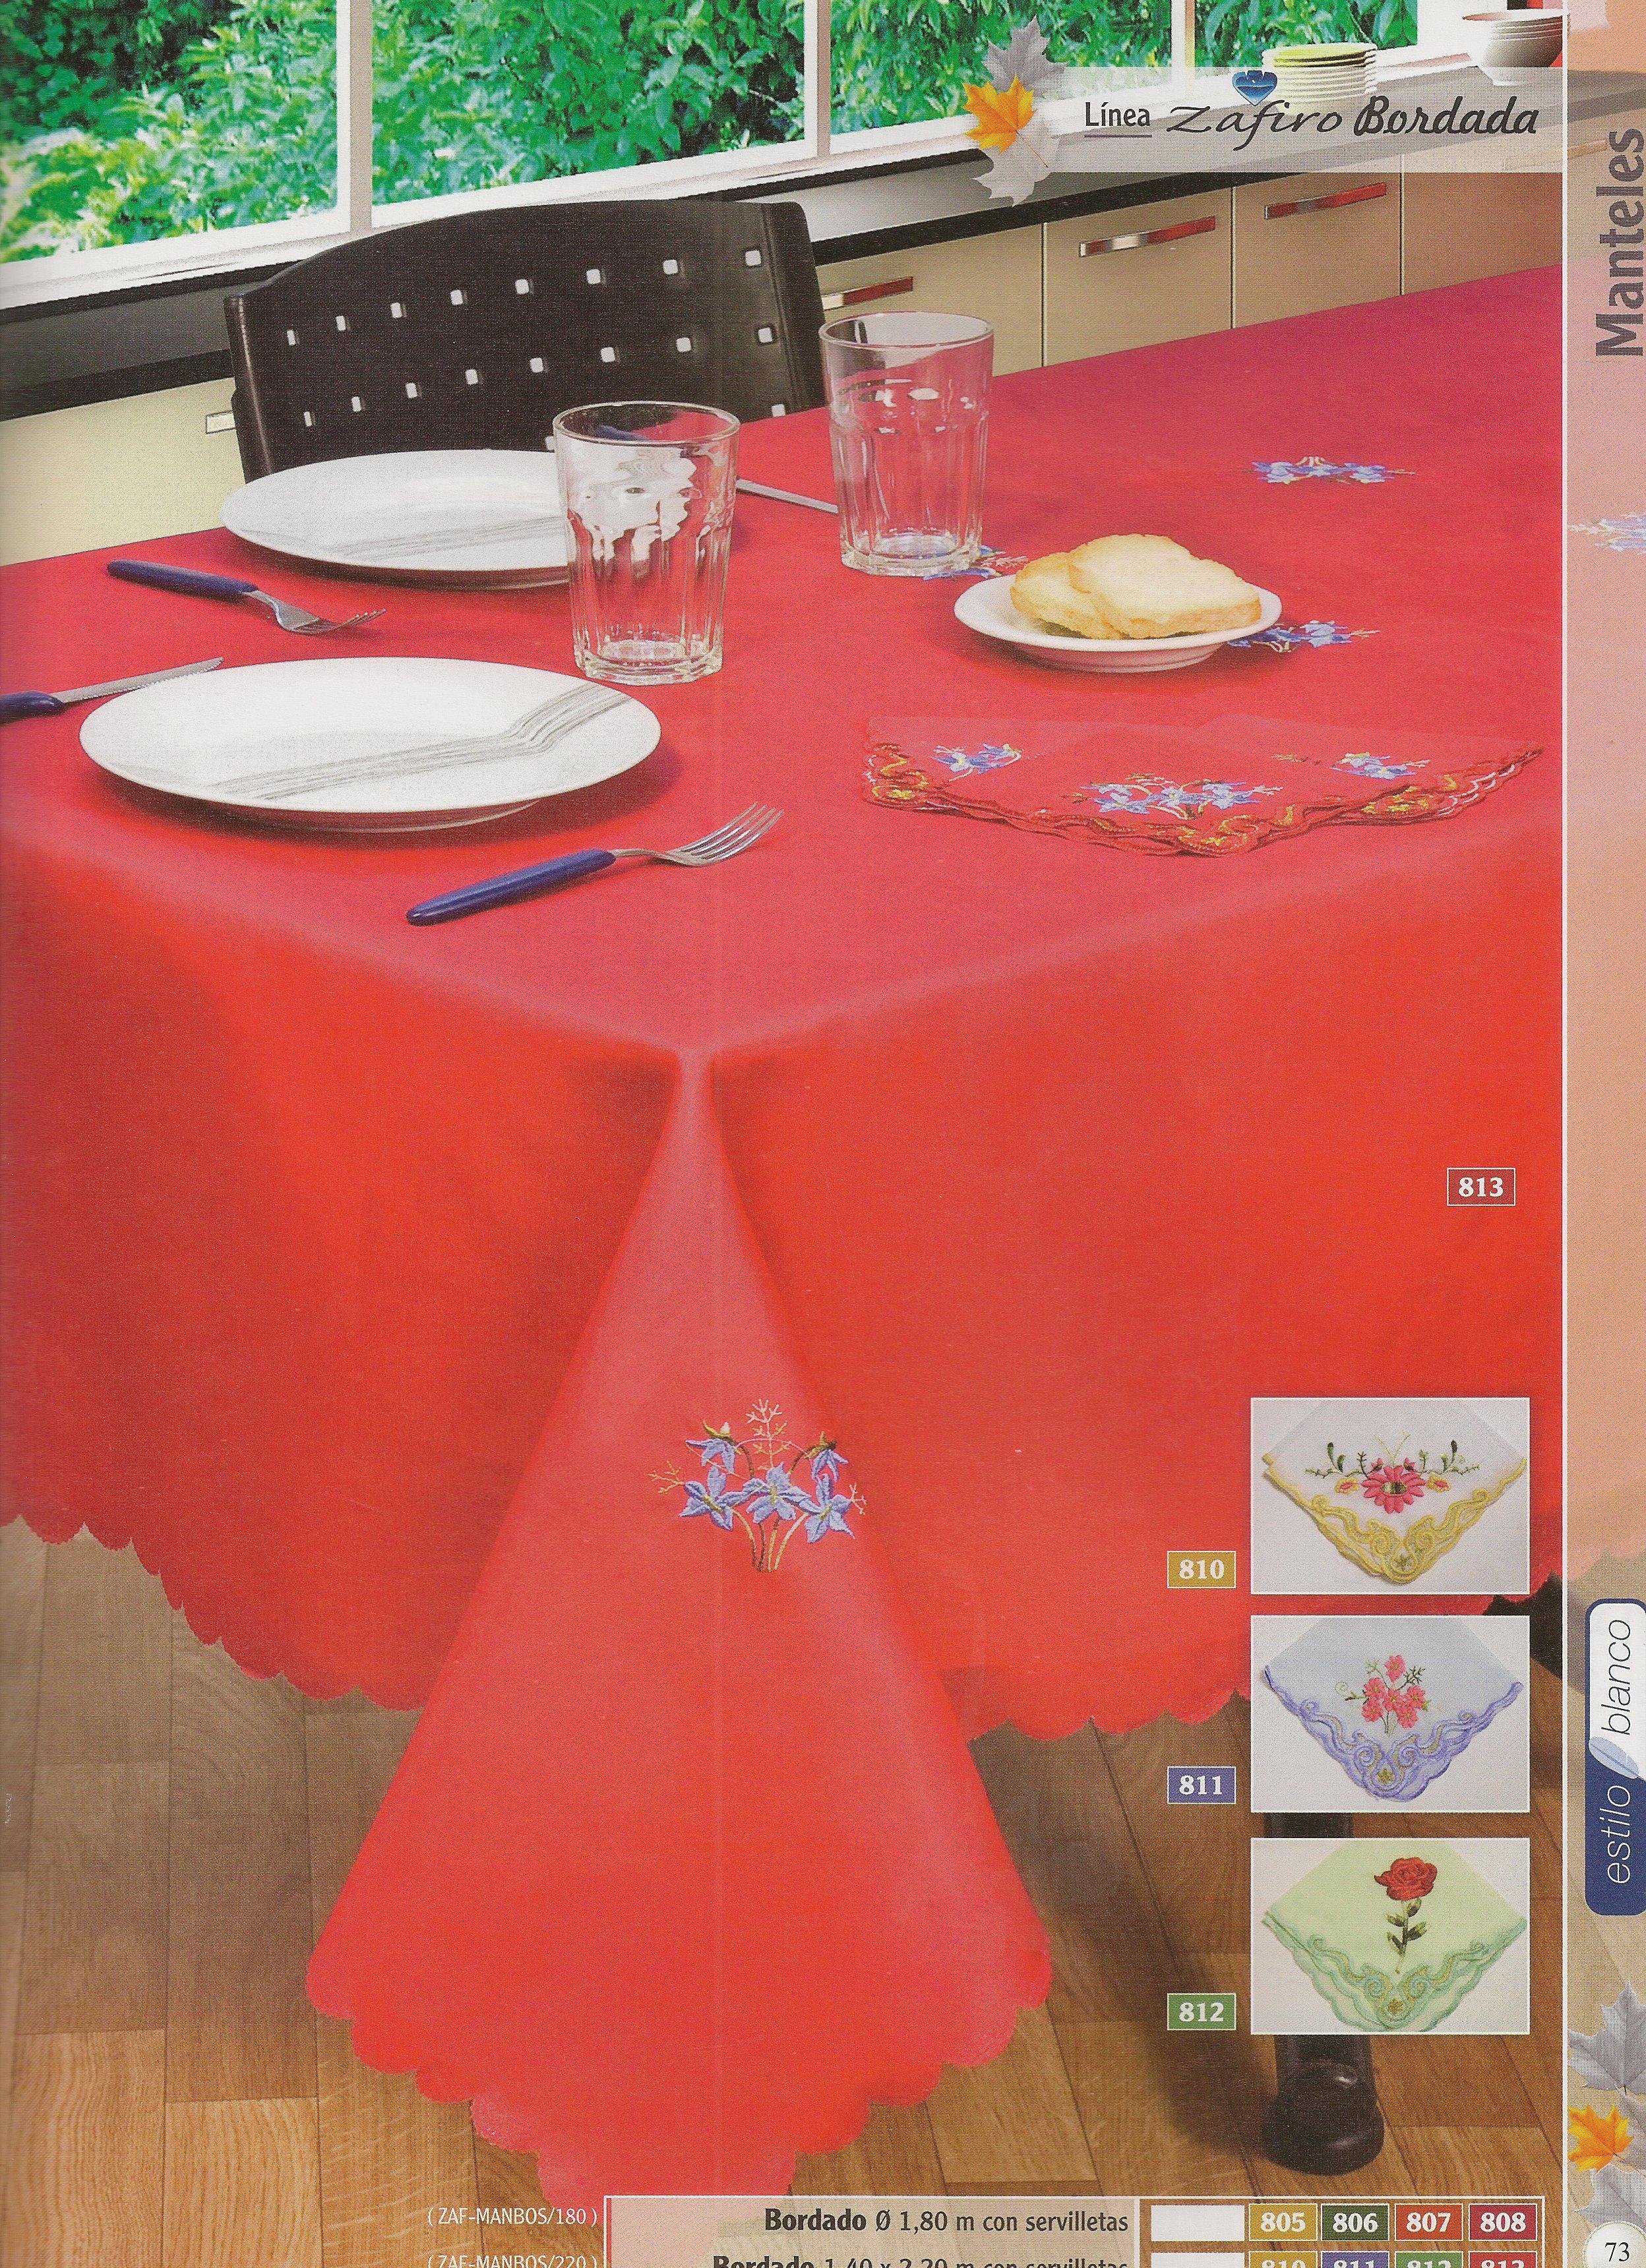 Linea zafiro bordada hogar muebles y jardin decoracion for Muebles y decoracion para el hogar